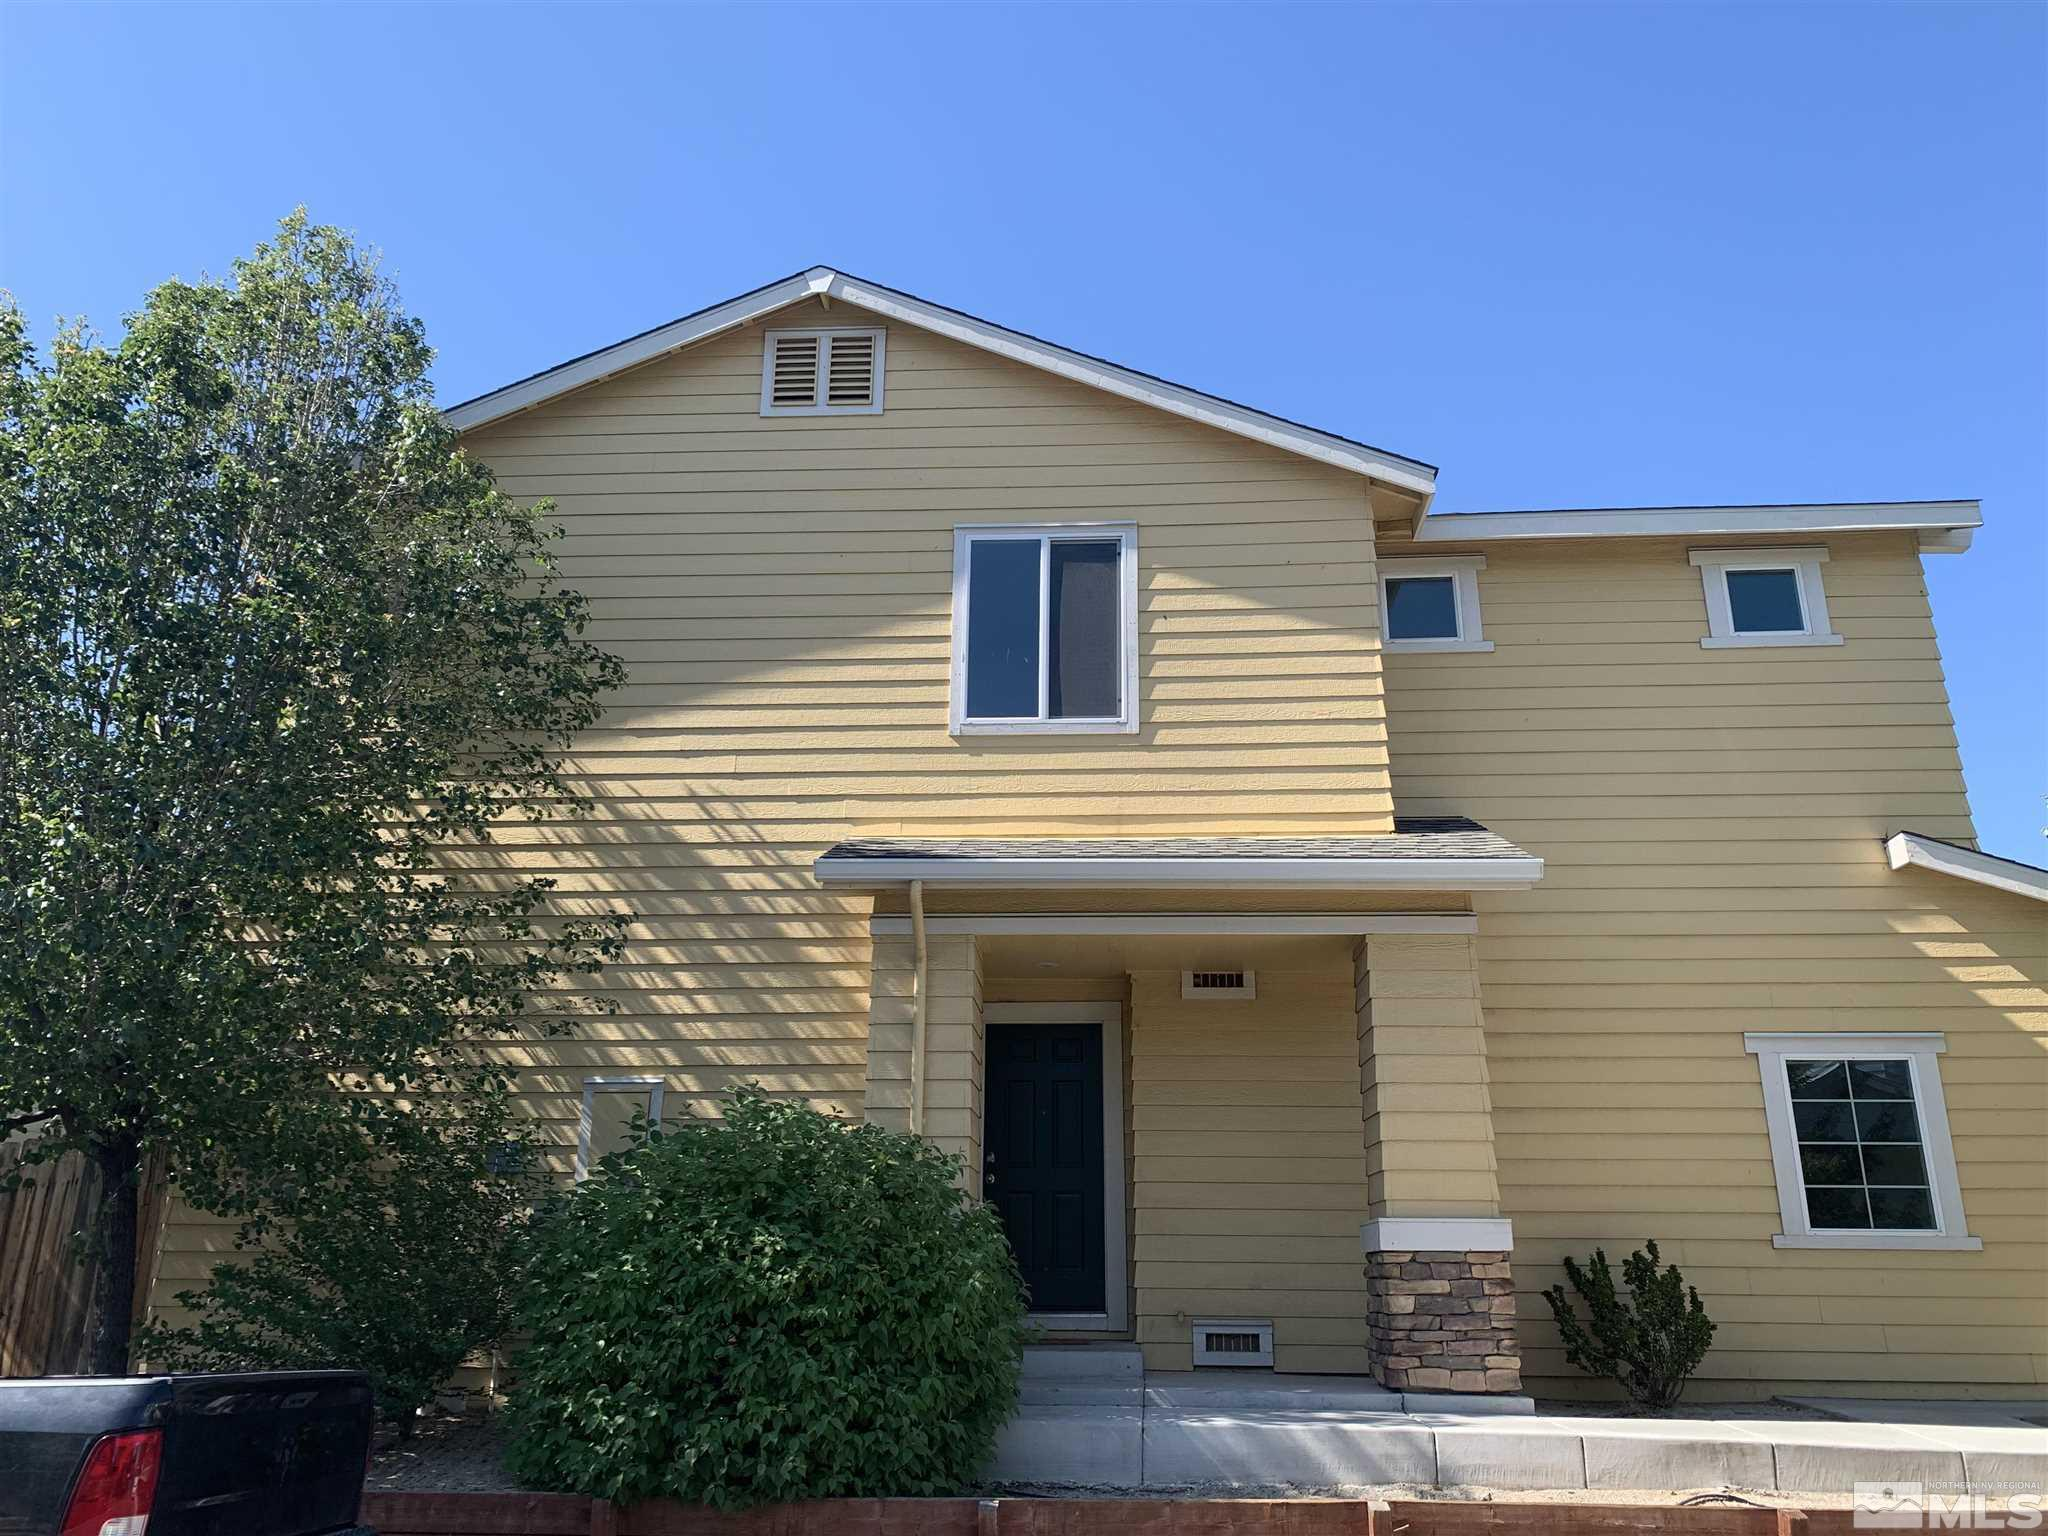 Image for 4650 Ashbrooke Dr, Reno, NV 89502